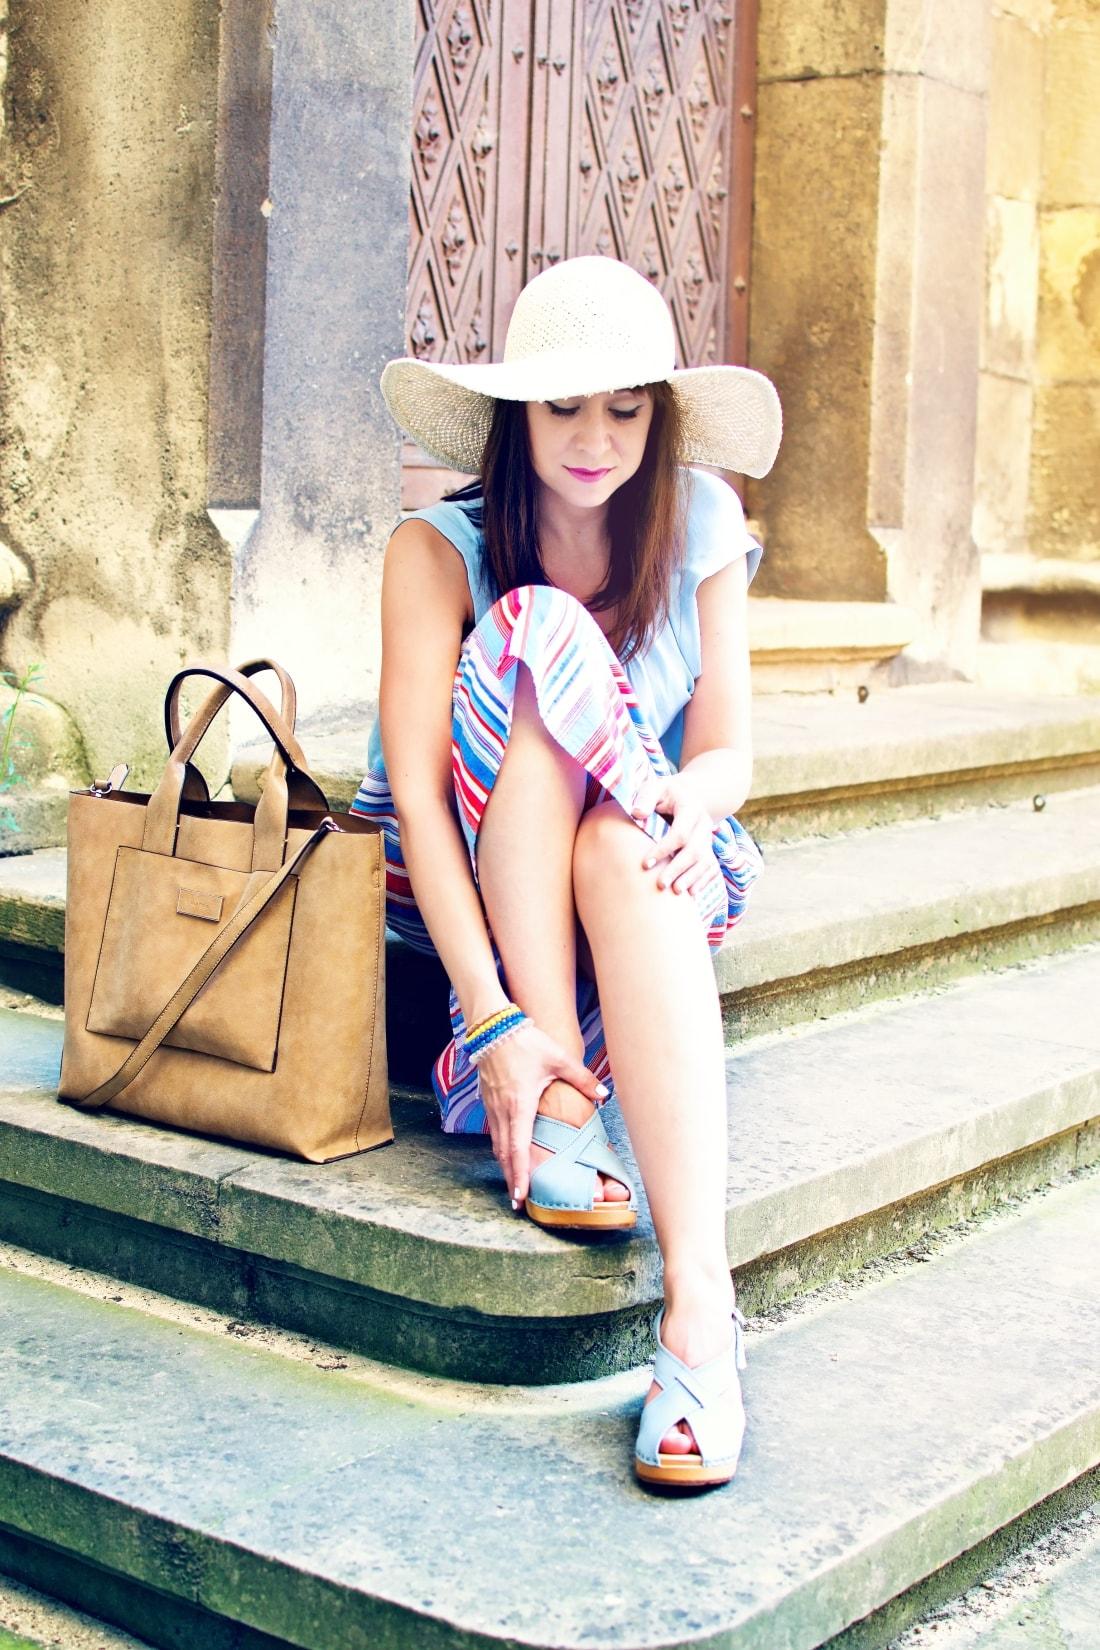 Handmade clogs_Katharine-fashion is beautiful blog 2a_Sandgrens_Modré Dreváky_Prúžkovaná sukňa_Katarína Jakubčová_Fashion blogger